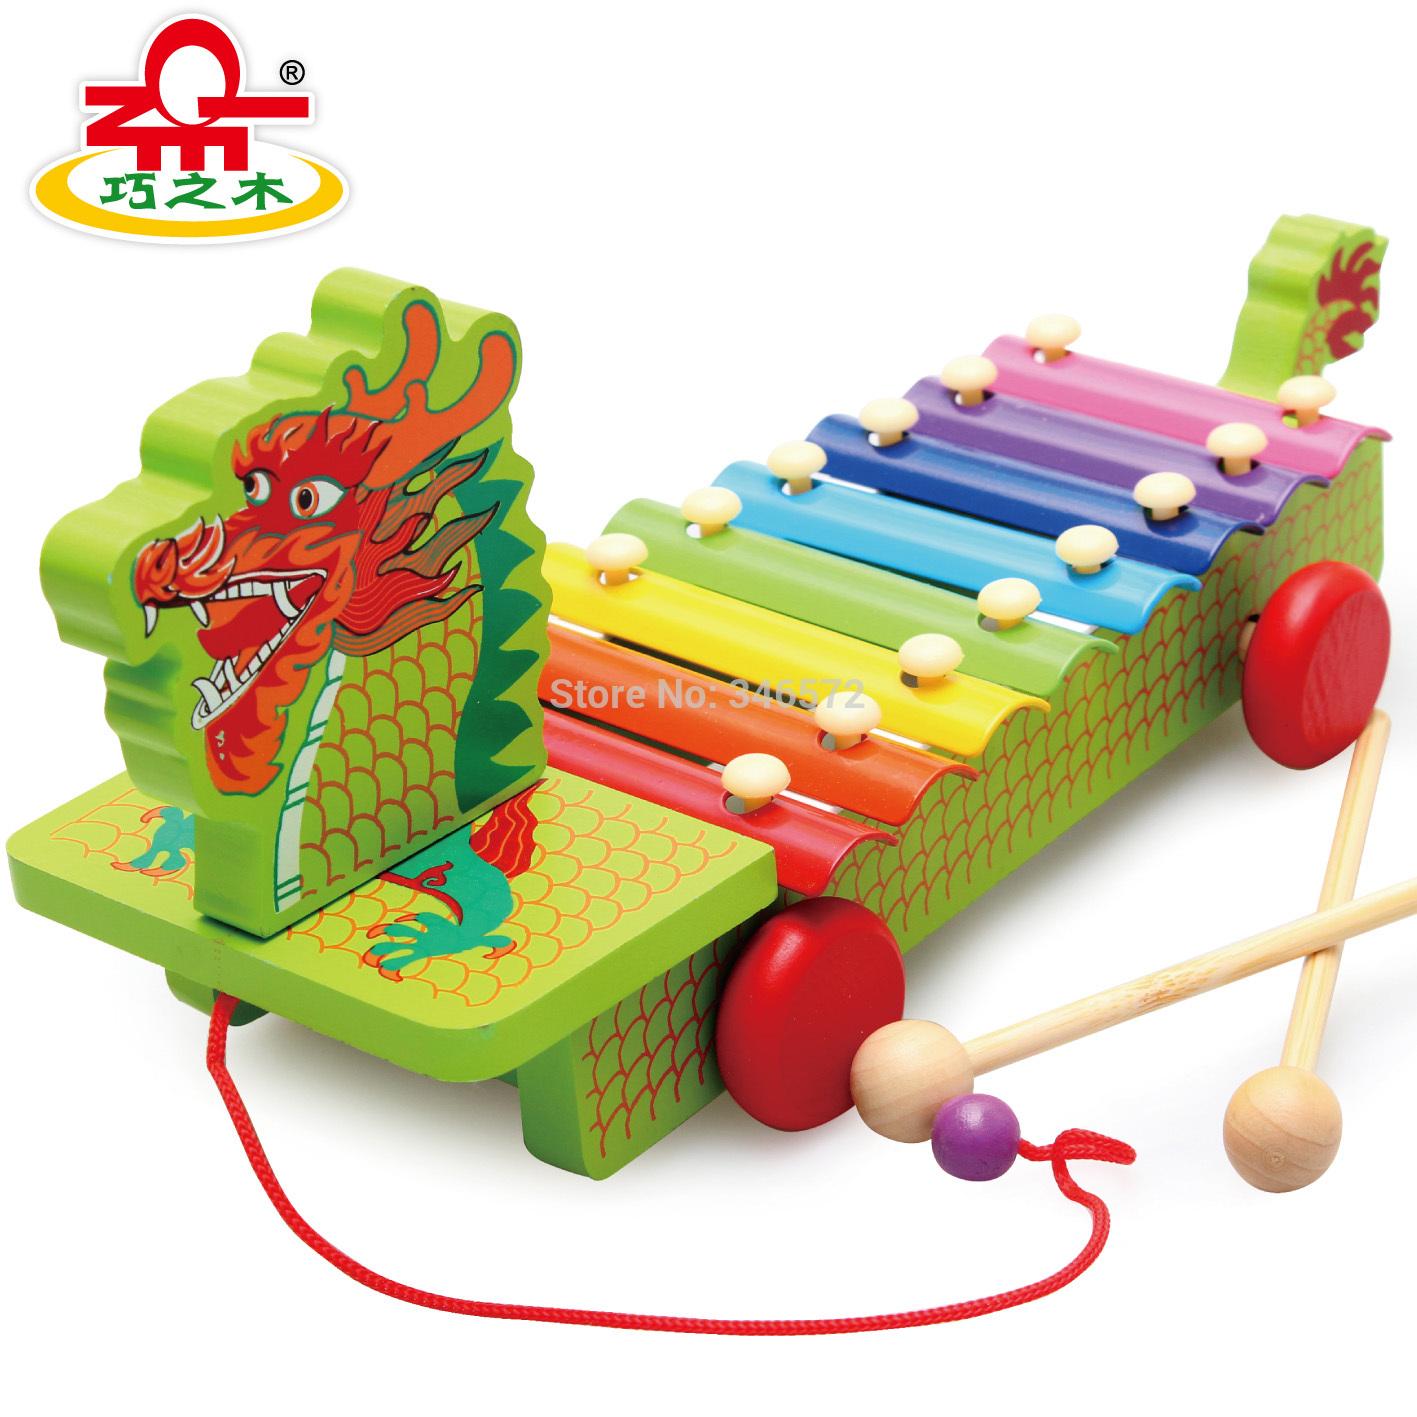 2014 kids blocks toys Wood child music teaching aids 8 violin hand knocking piano wooden educational toys(China (Mainland))